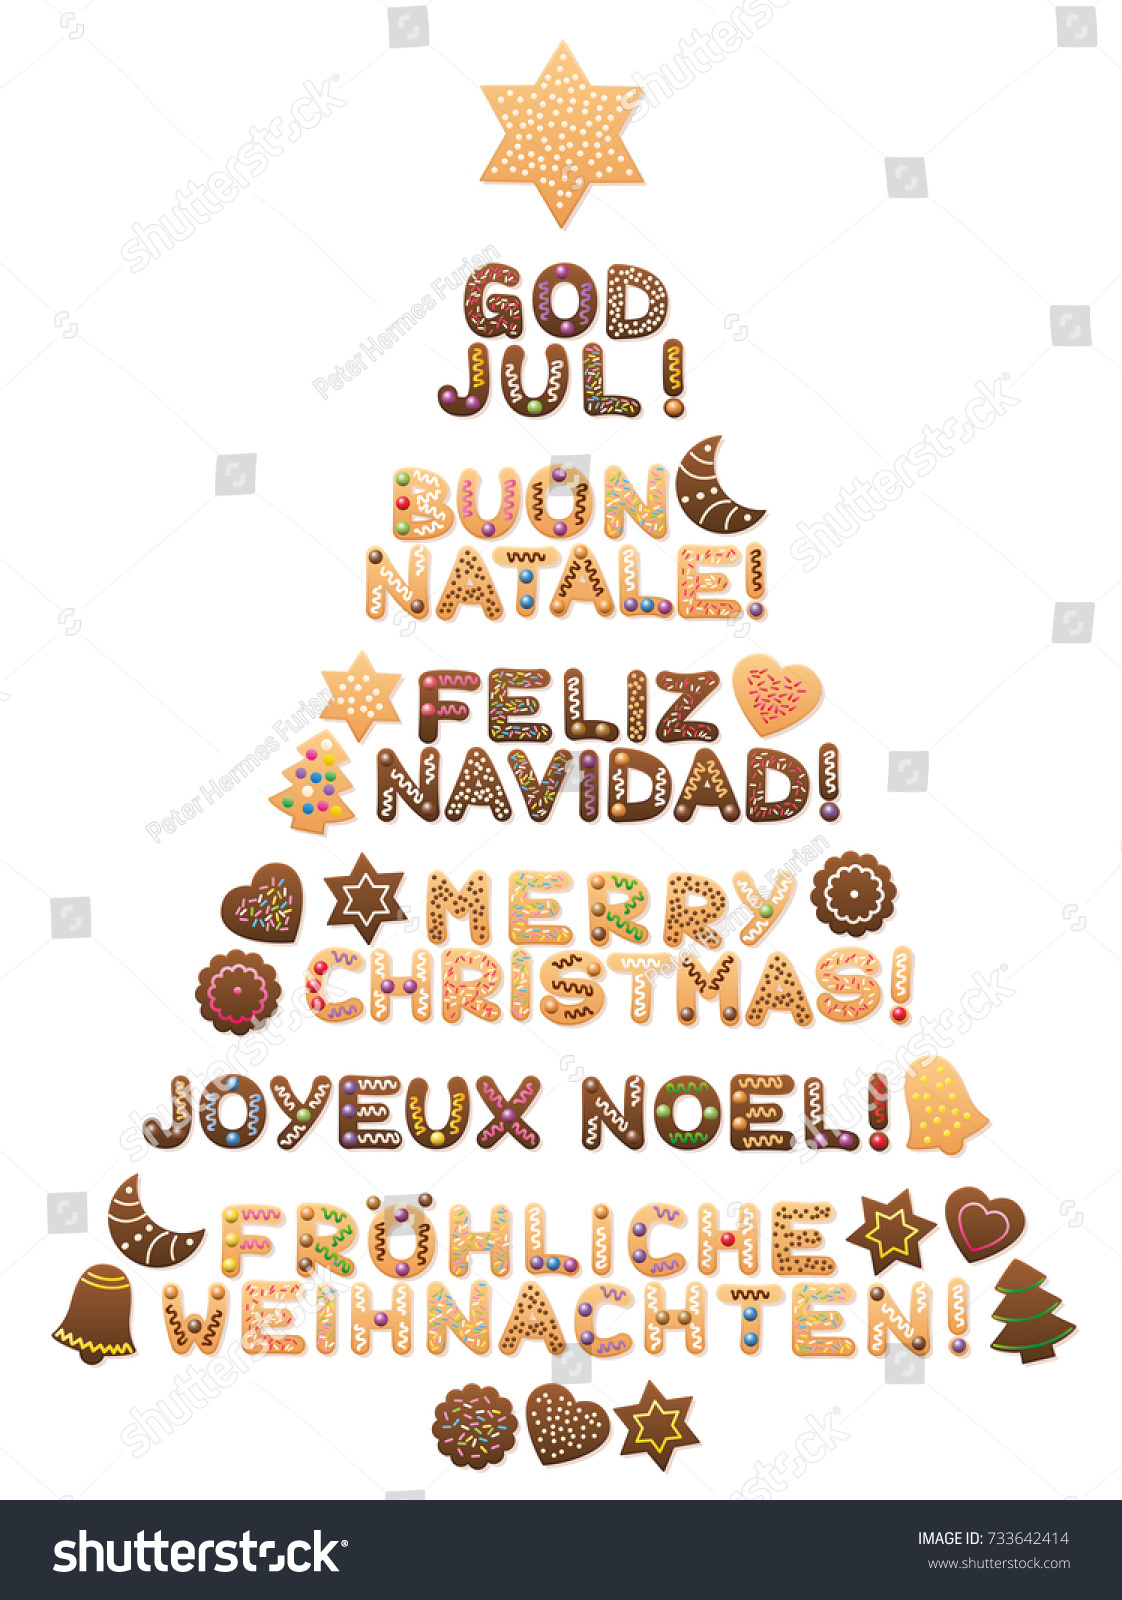 Merry Christmas German.Merry Christmas Written Swedish Italian Spanish Stock Vector